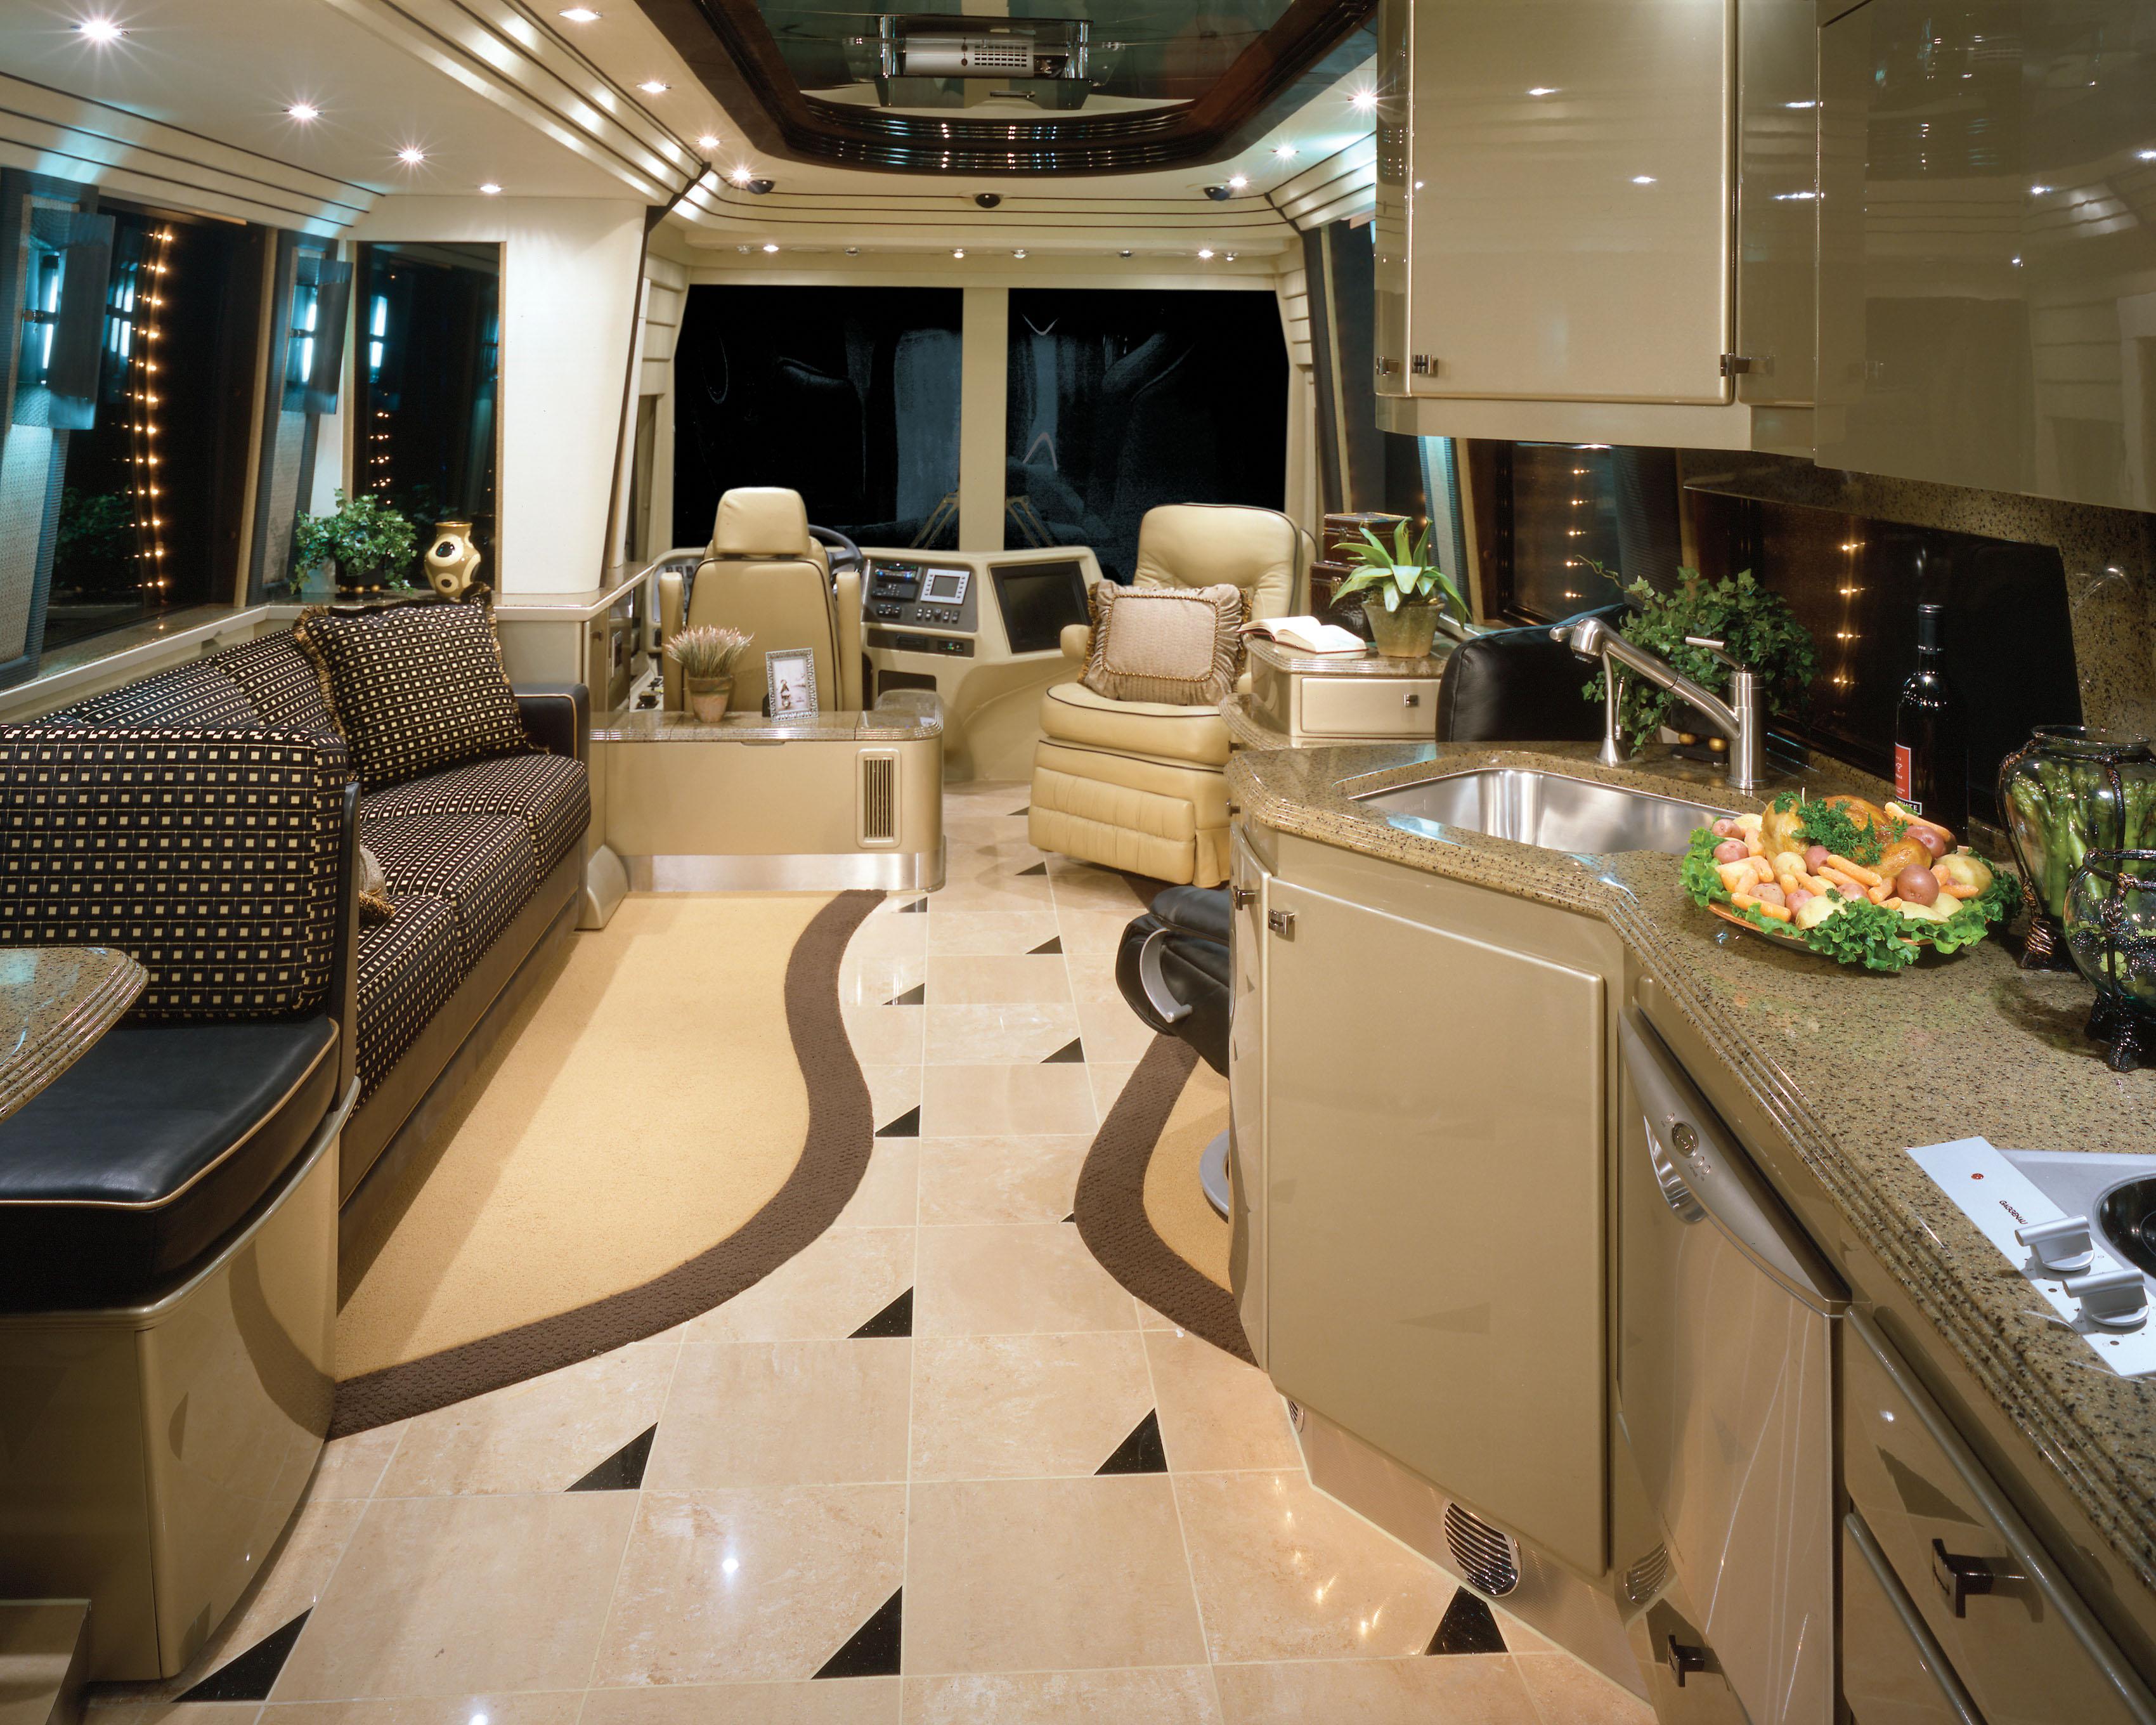 Motor Home Ideas On Pinterest Motorhome Interior Motorhome And